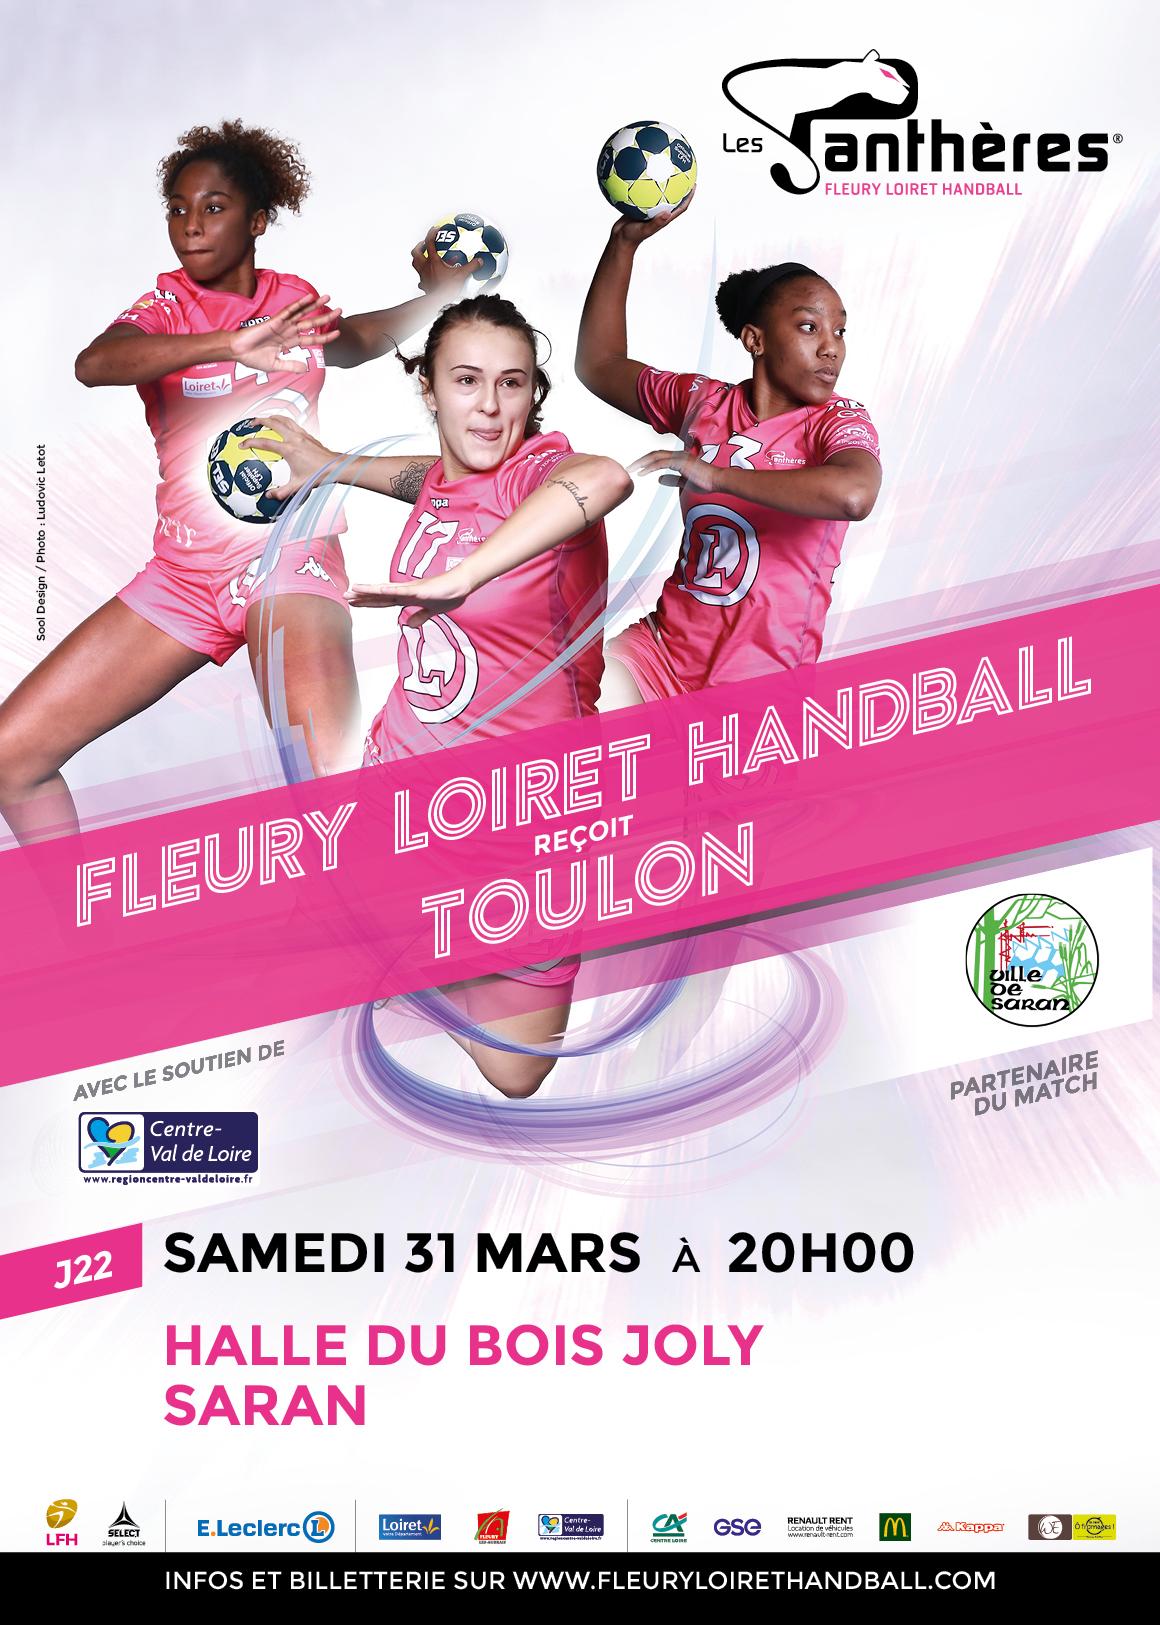 FLHB-MatchJ22-Toulon.jpg